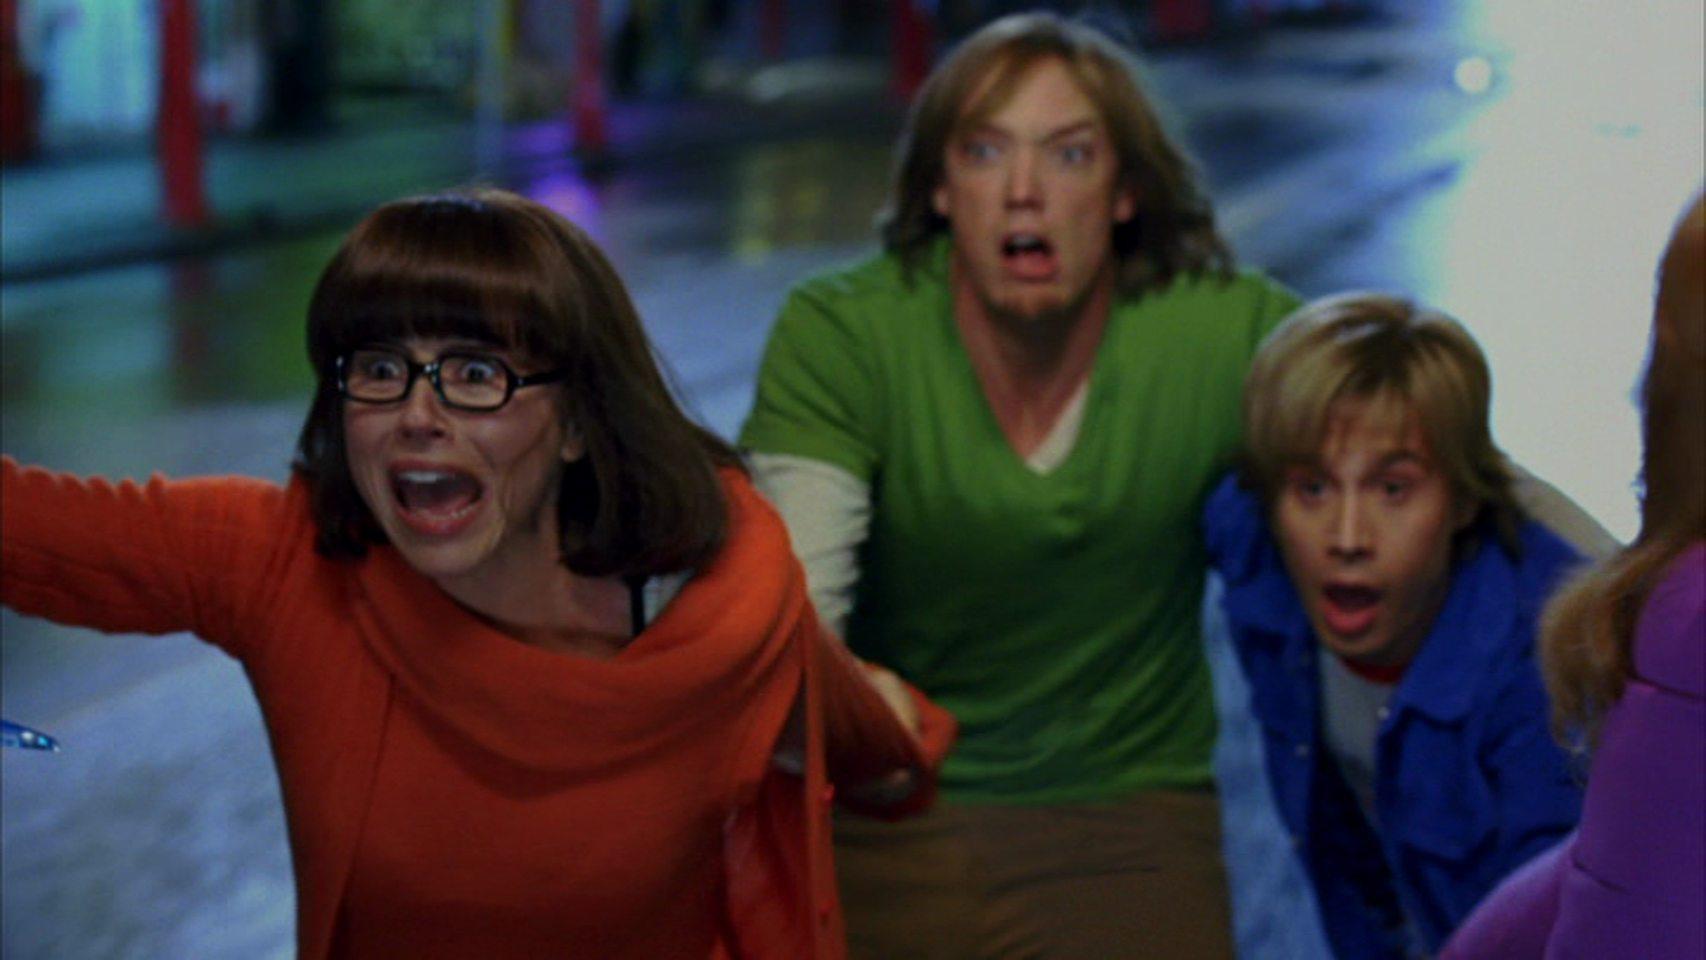 Scooby Doo 2 Monsters Unleashed Scooby Doo Image 21455333 Fanpop